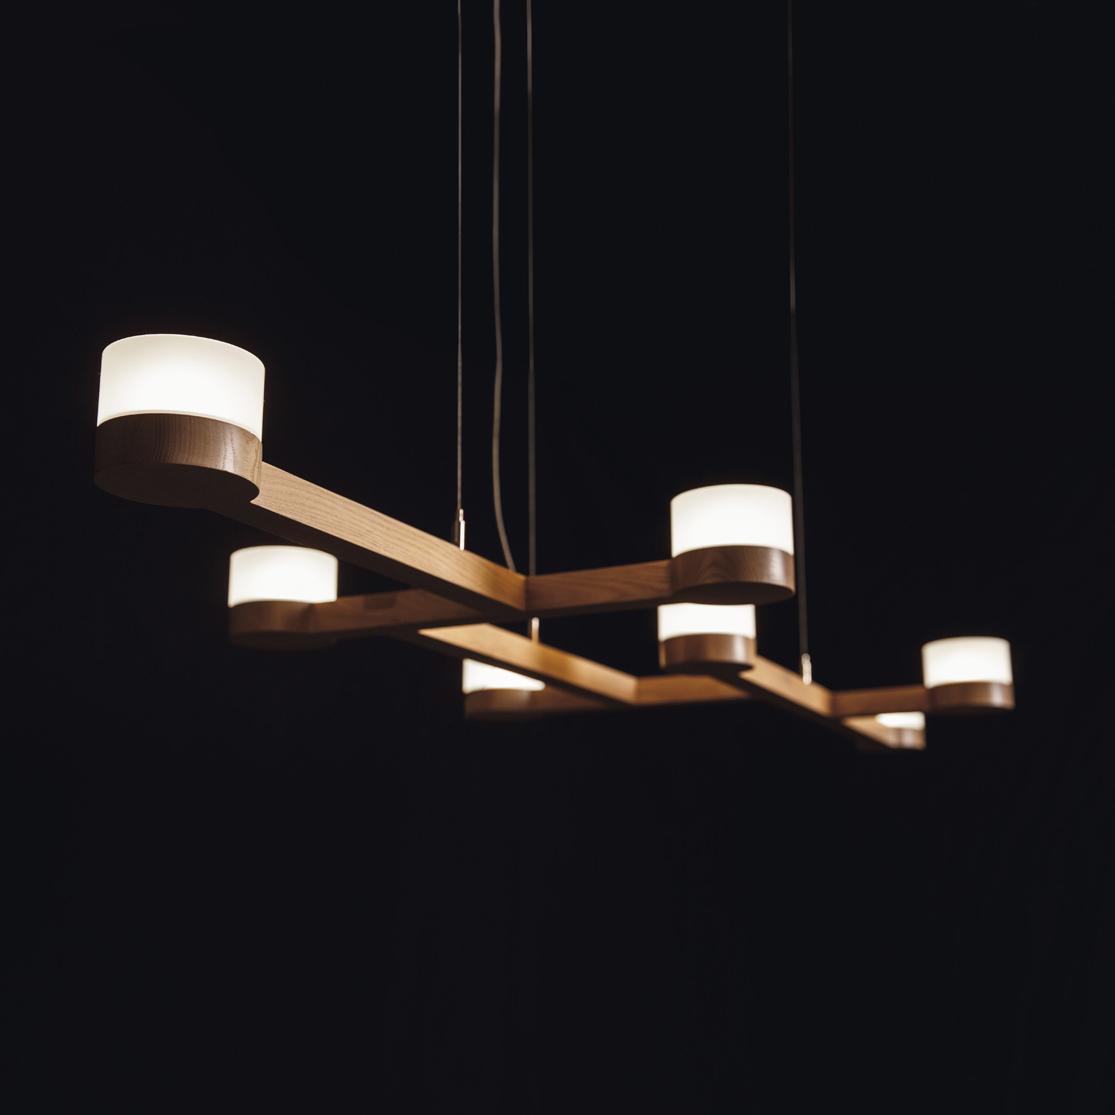 bespoke-ash-chandelier-led-adanac-7-SQ.jpg